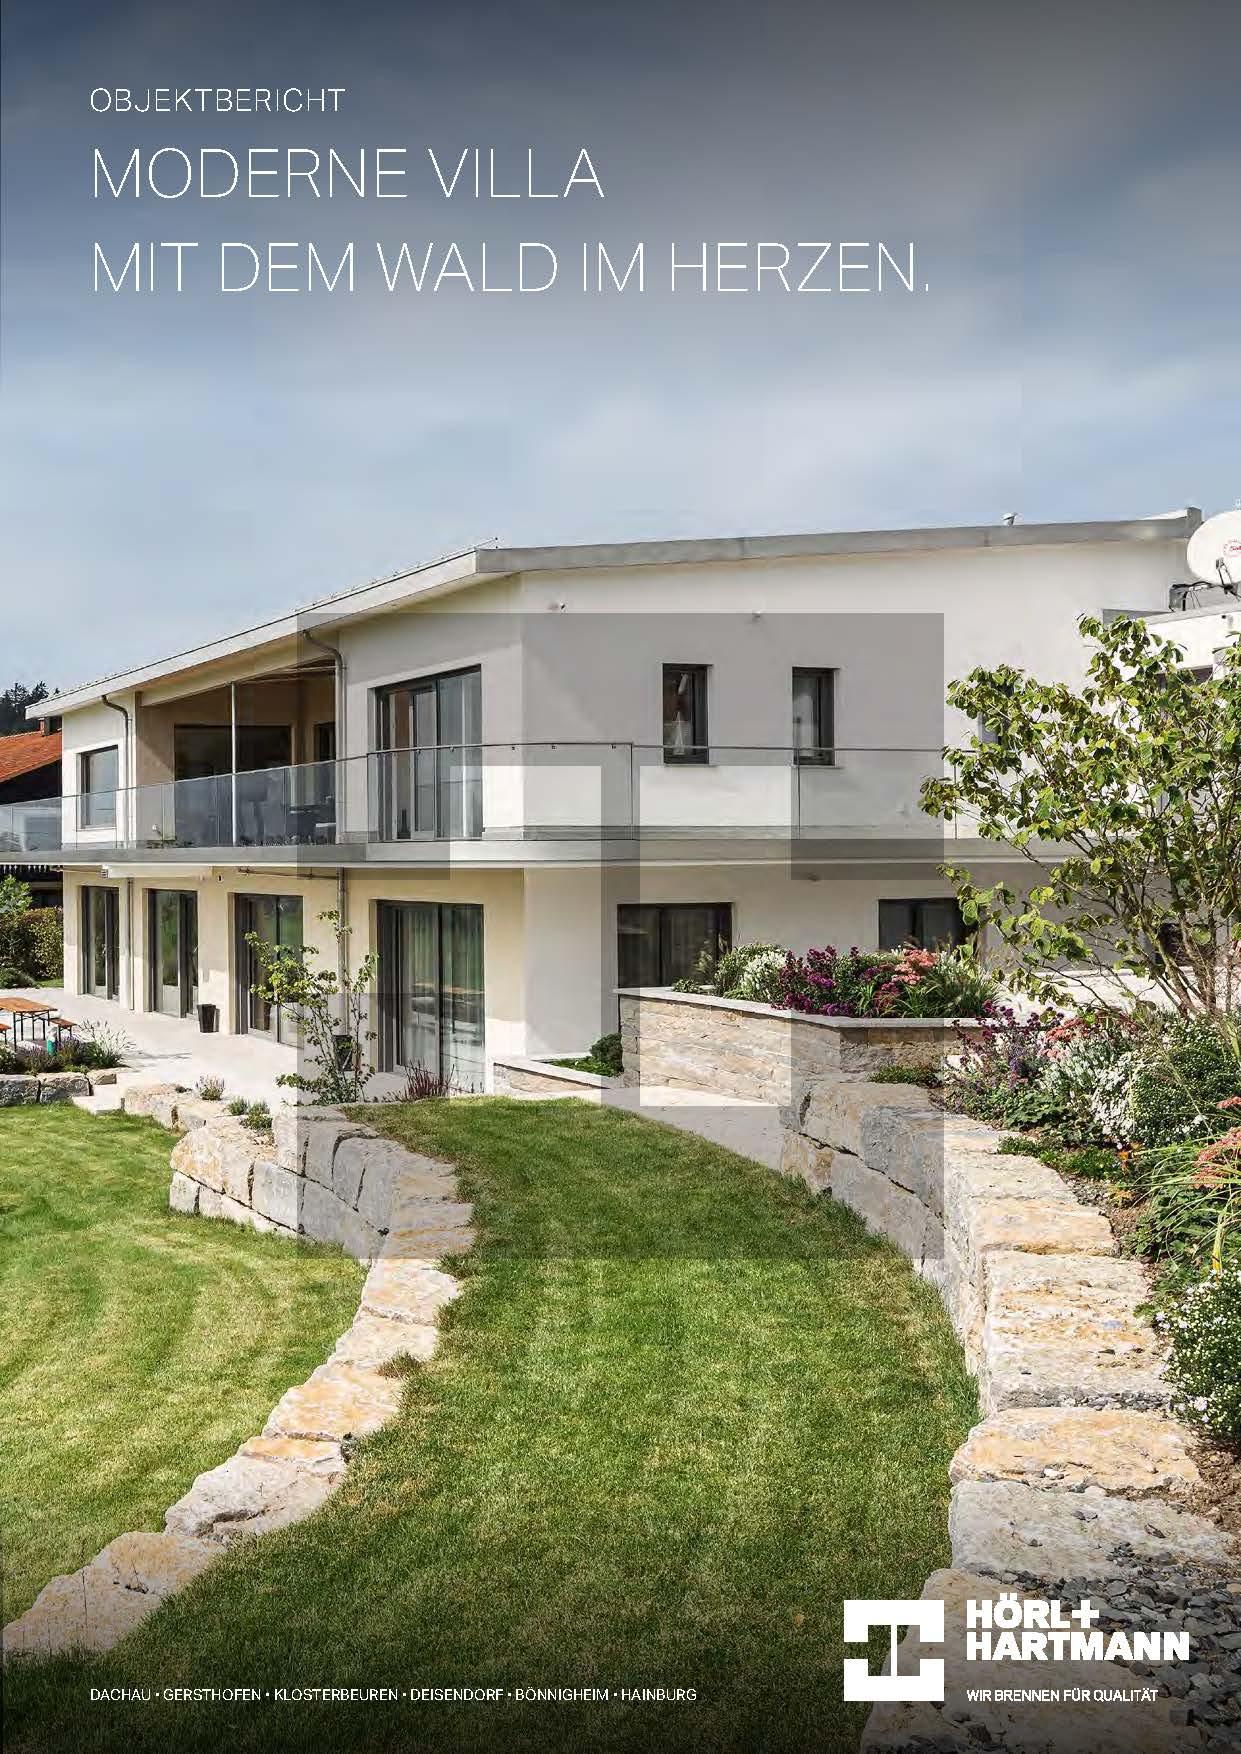 Hörl+Hartmann Objektbericht Moderne Villa in Kempten